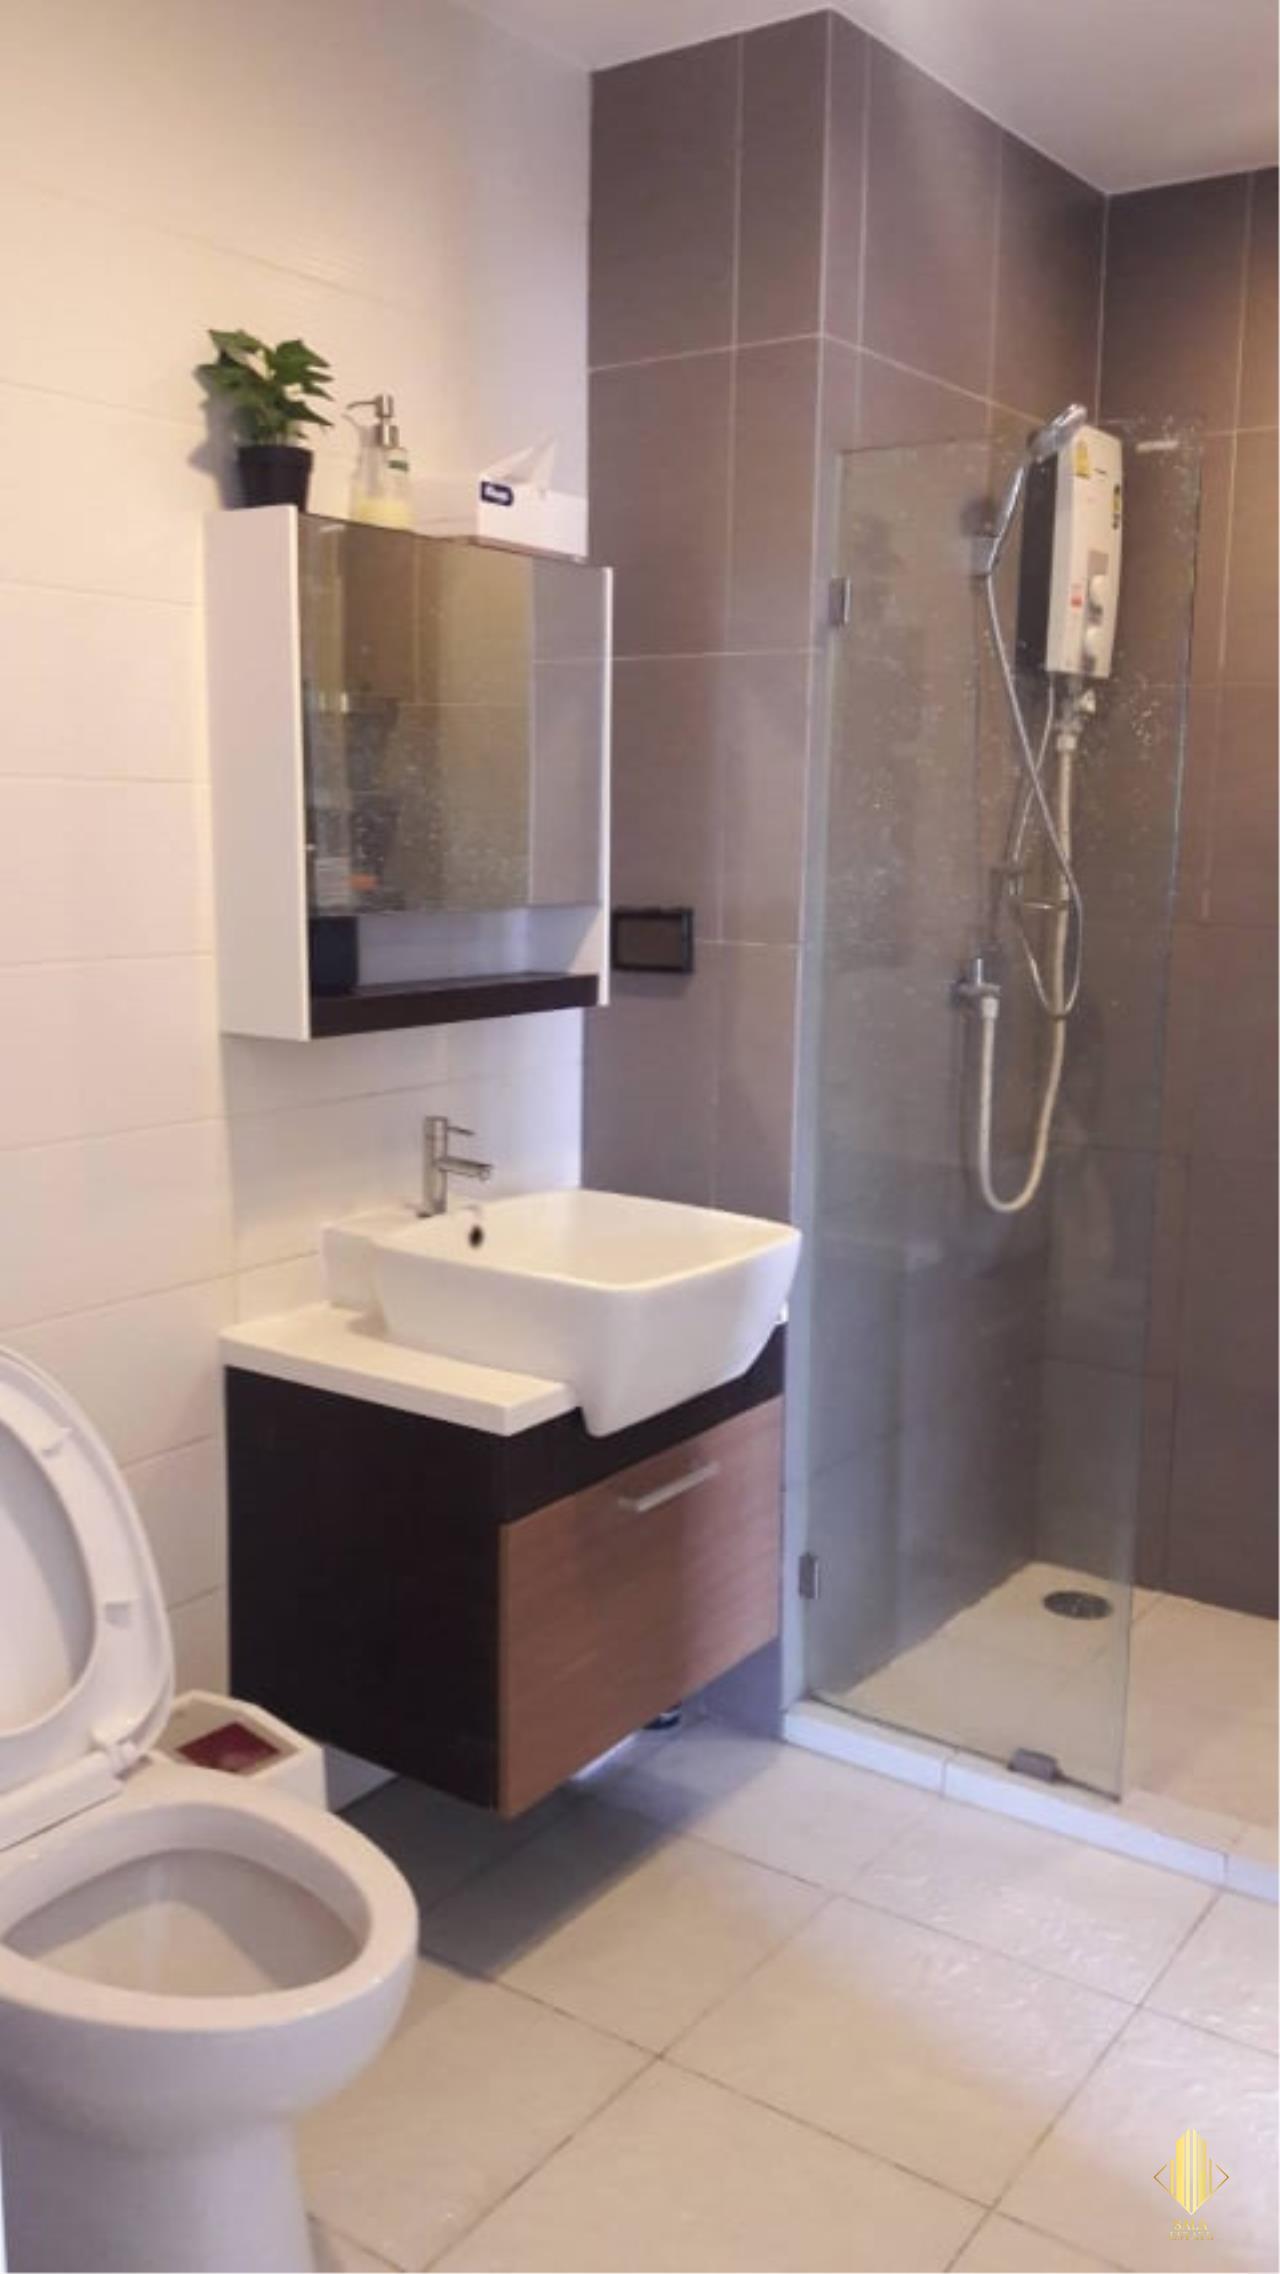 SALA ESTATE Agency's WHIZDOM 101 @PUNNAWITHI STATION , 1 BEDROOM 1 BATHROOM, FULLY FURNISHED 4